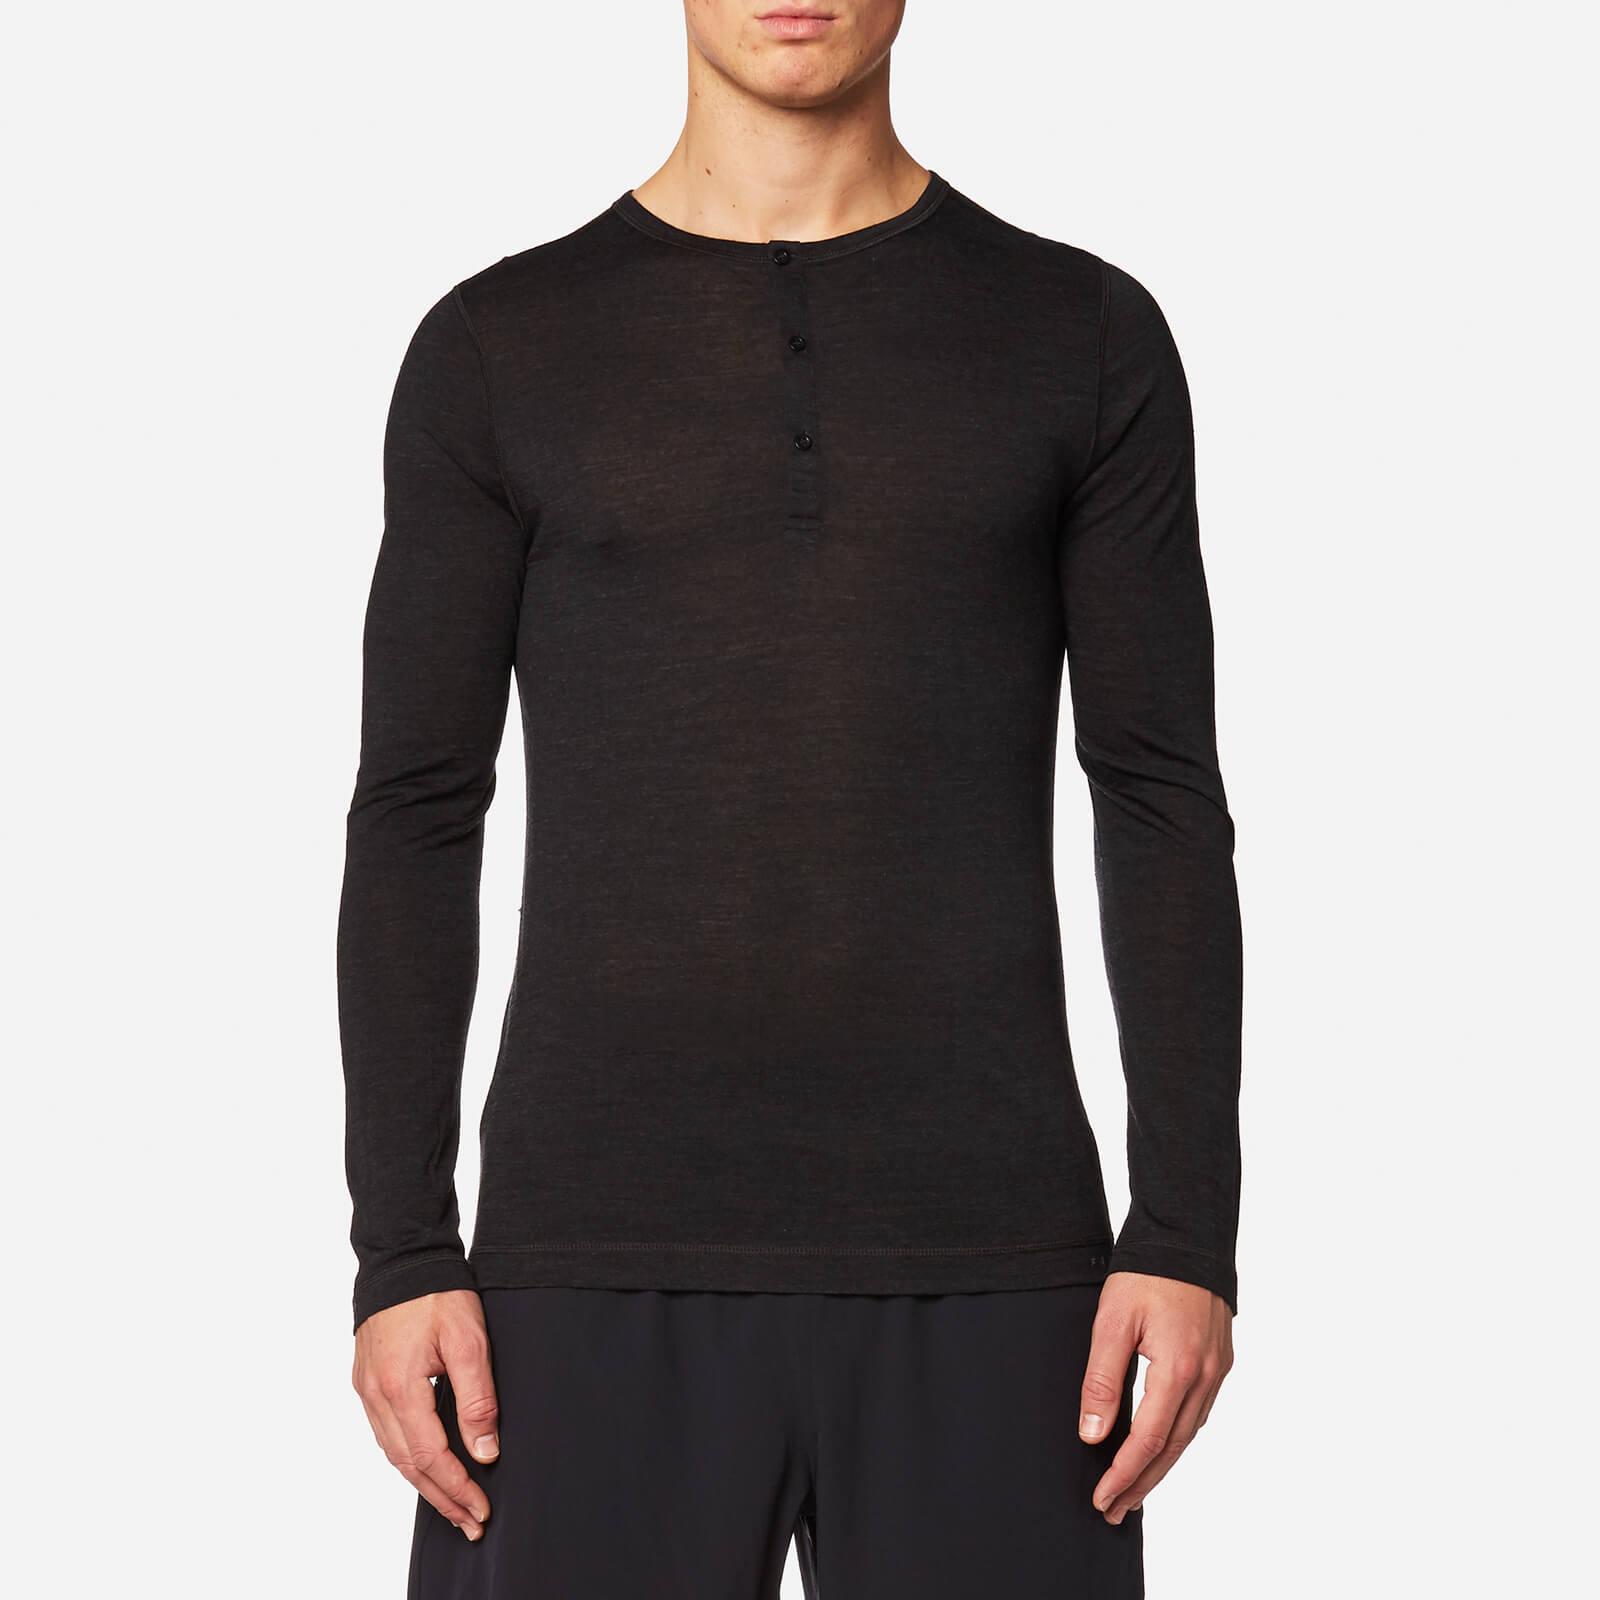 2858d1c7 FALKE Ergonomic Sport System Men's Long Sleeved Henley Silk-Wool Top -  Anthracite Mel - Free UK Delivery over £50